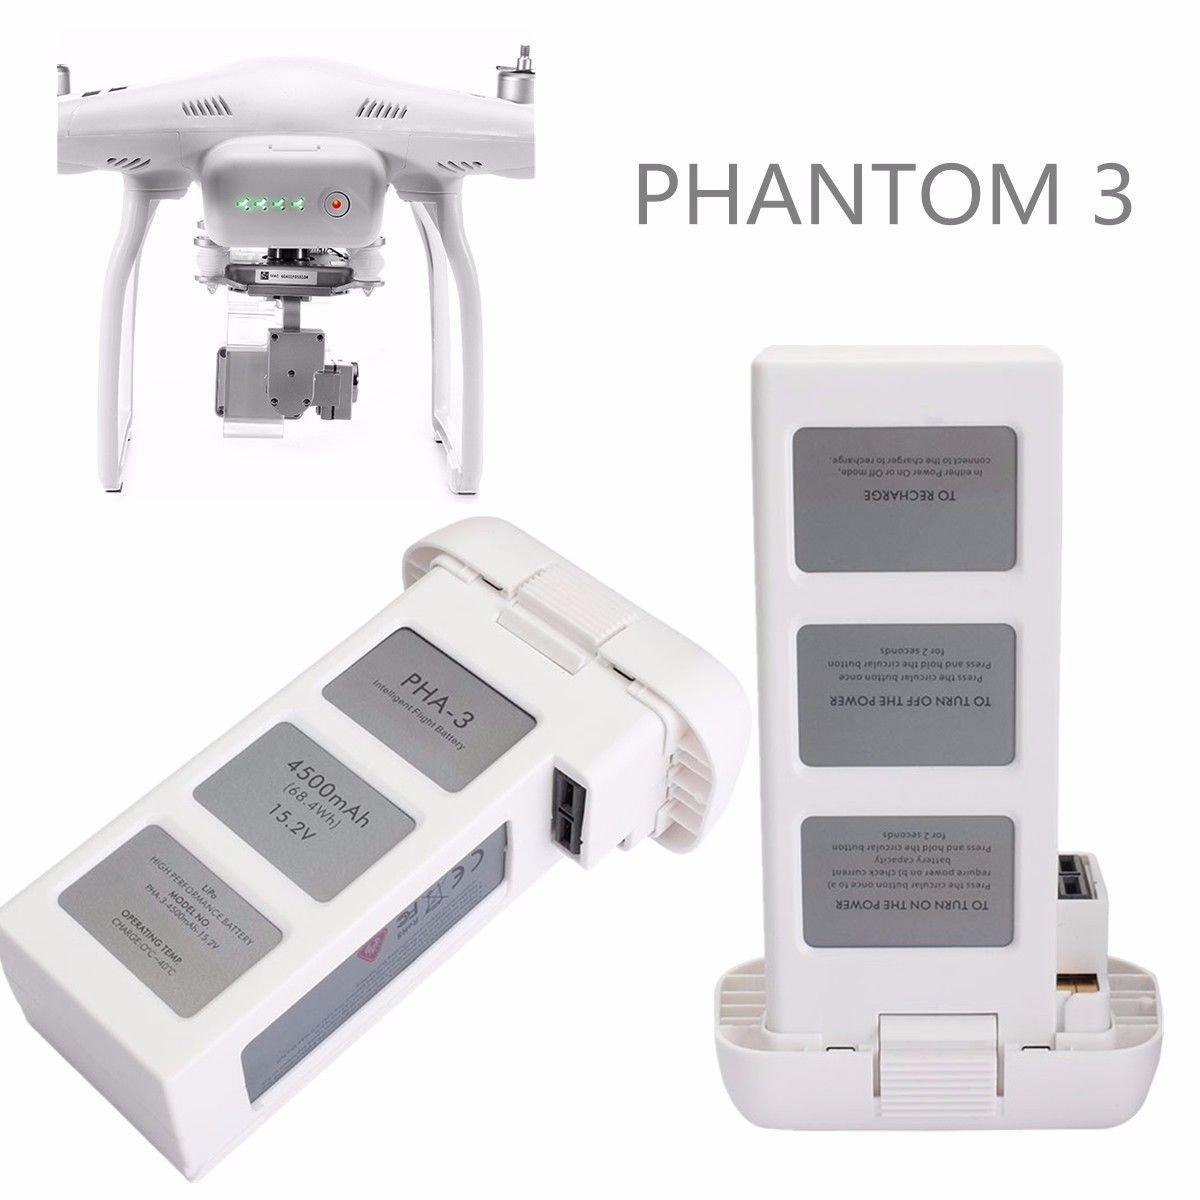 4500mAh 15.2V 4S Advanced Battery Intelligent Flight For DJI Phantom 3 Drone dbb